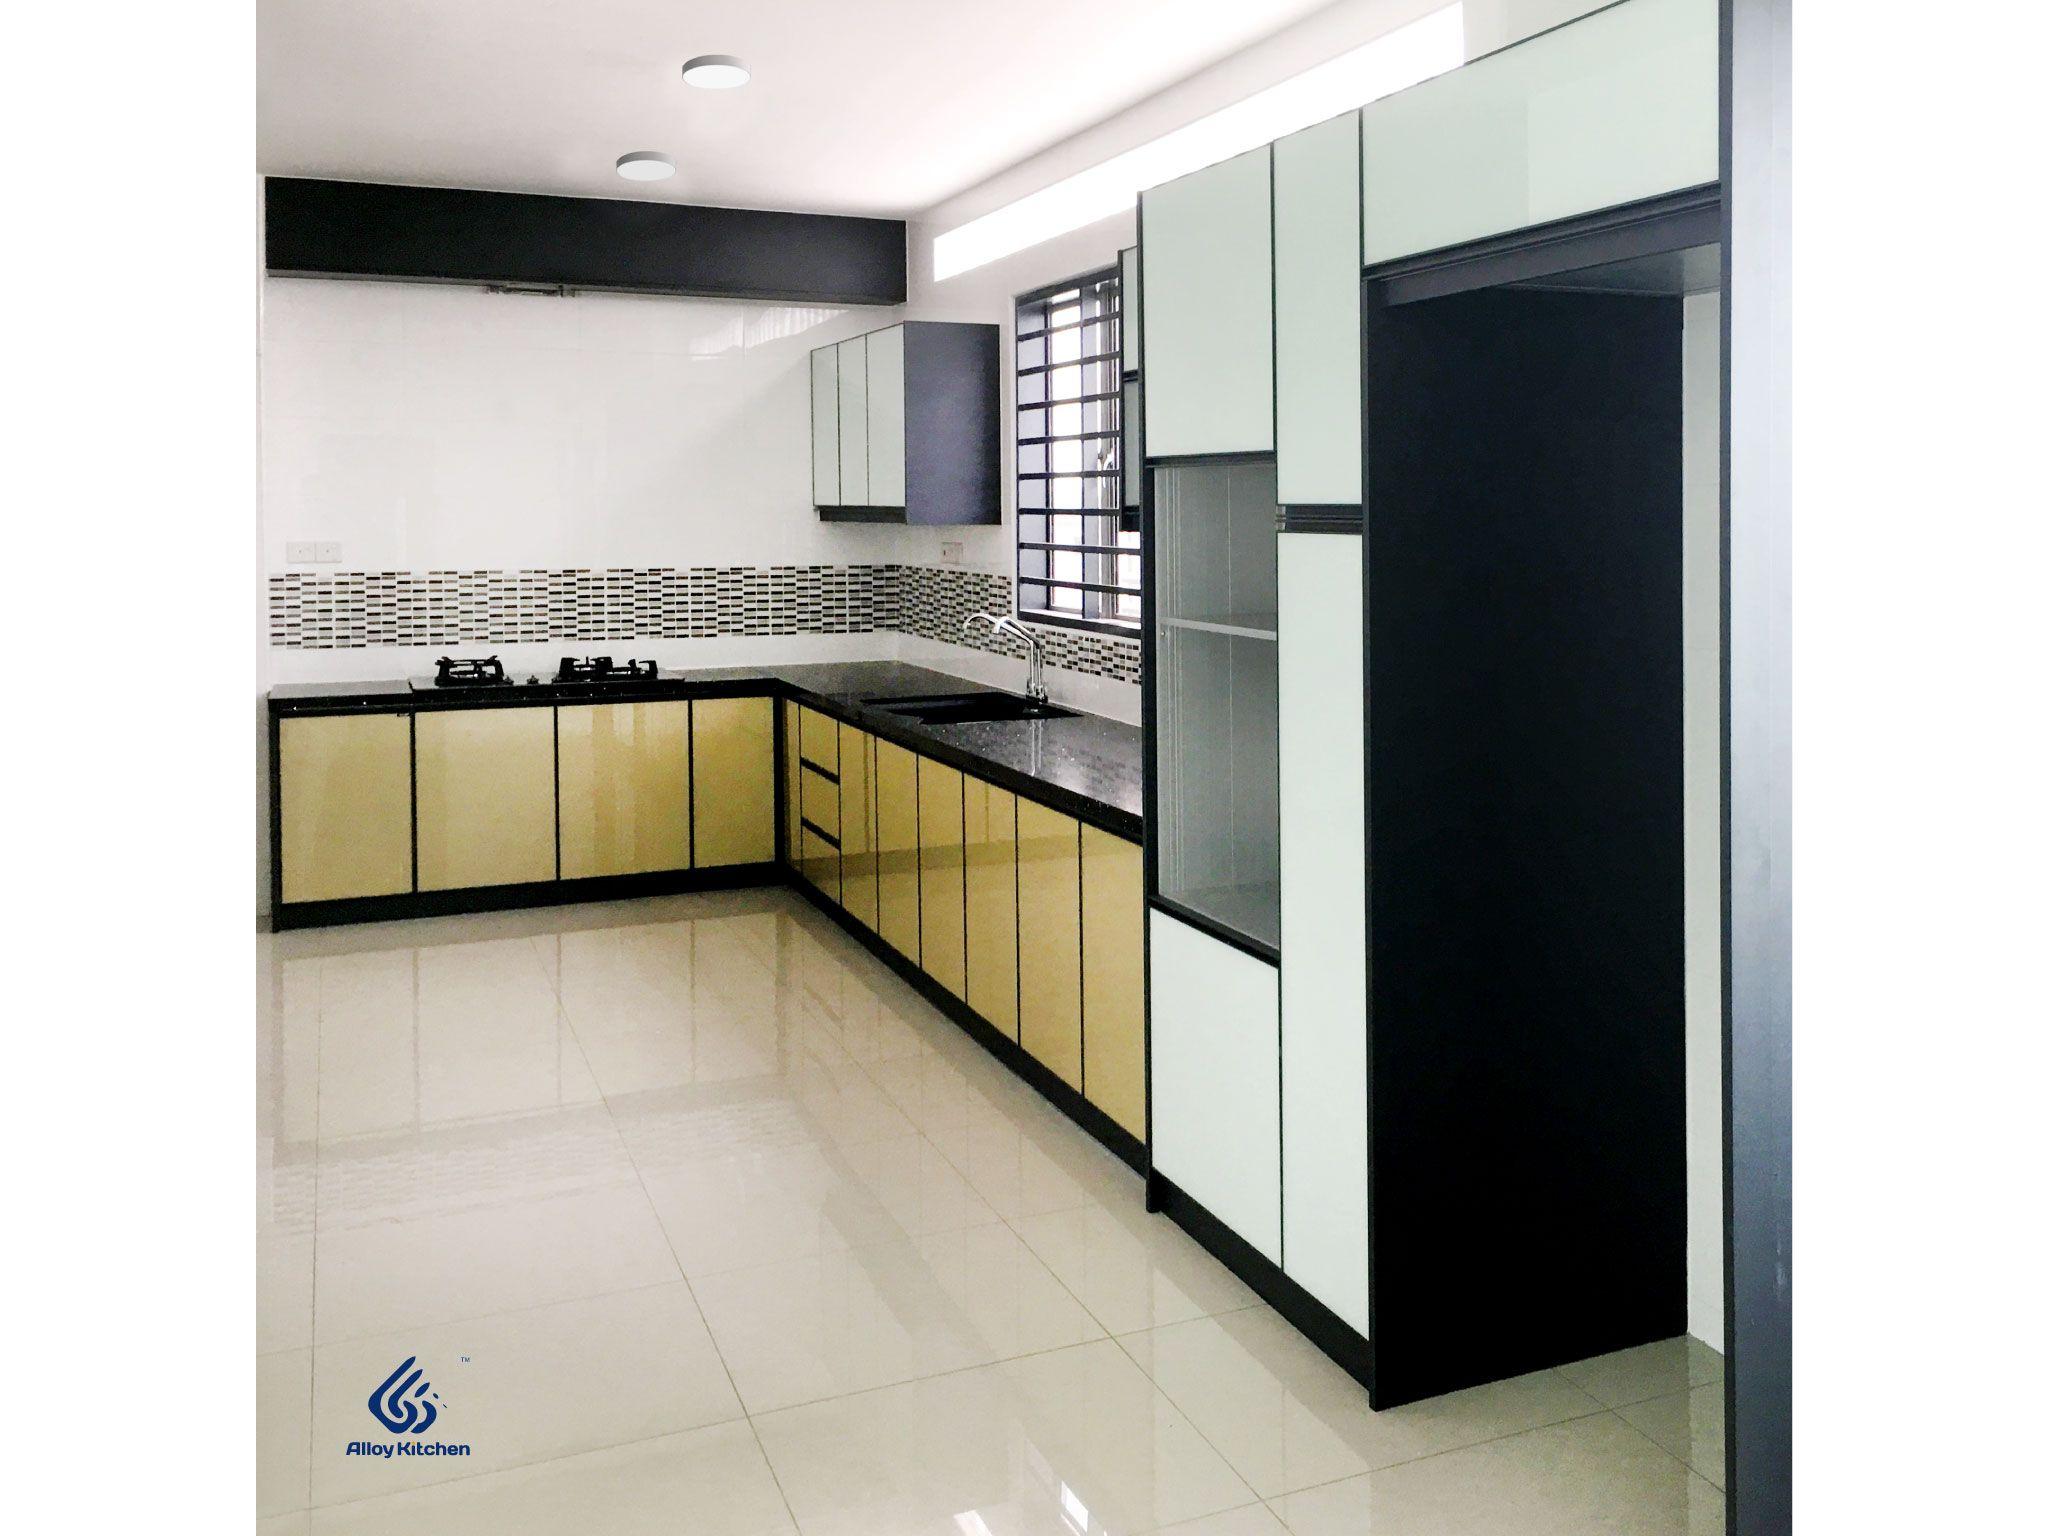 3G Aluminium Kitchen Aluminium kitchen, Aluminum